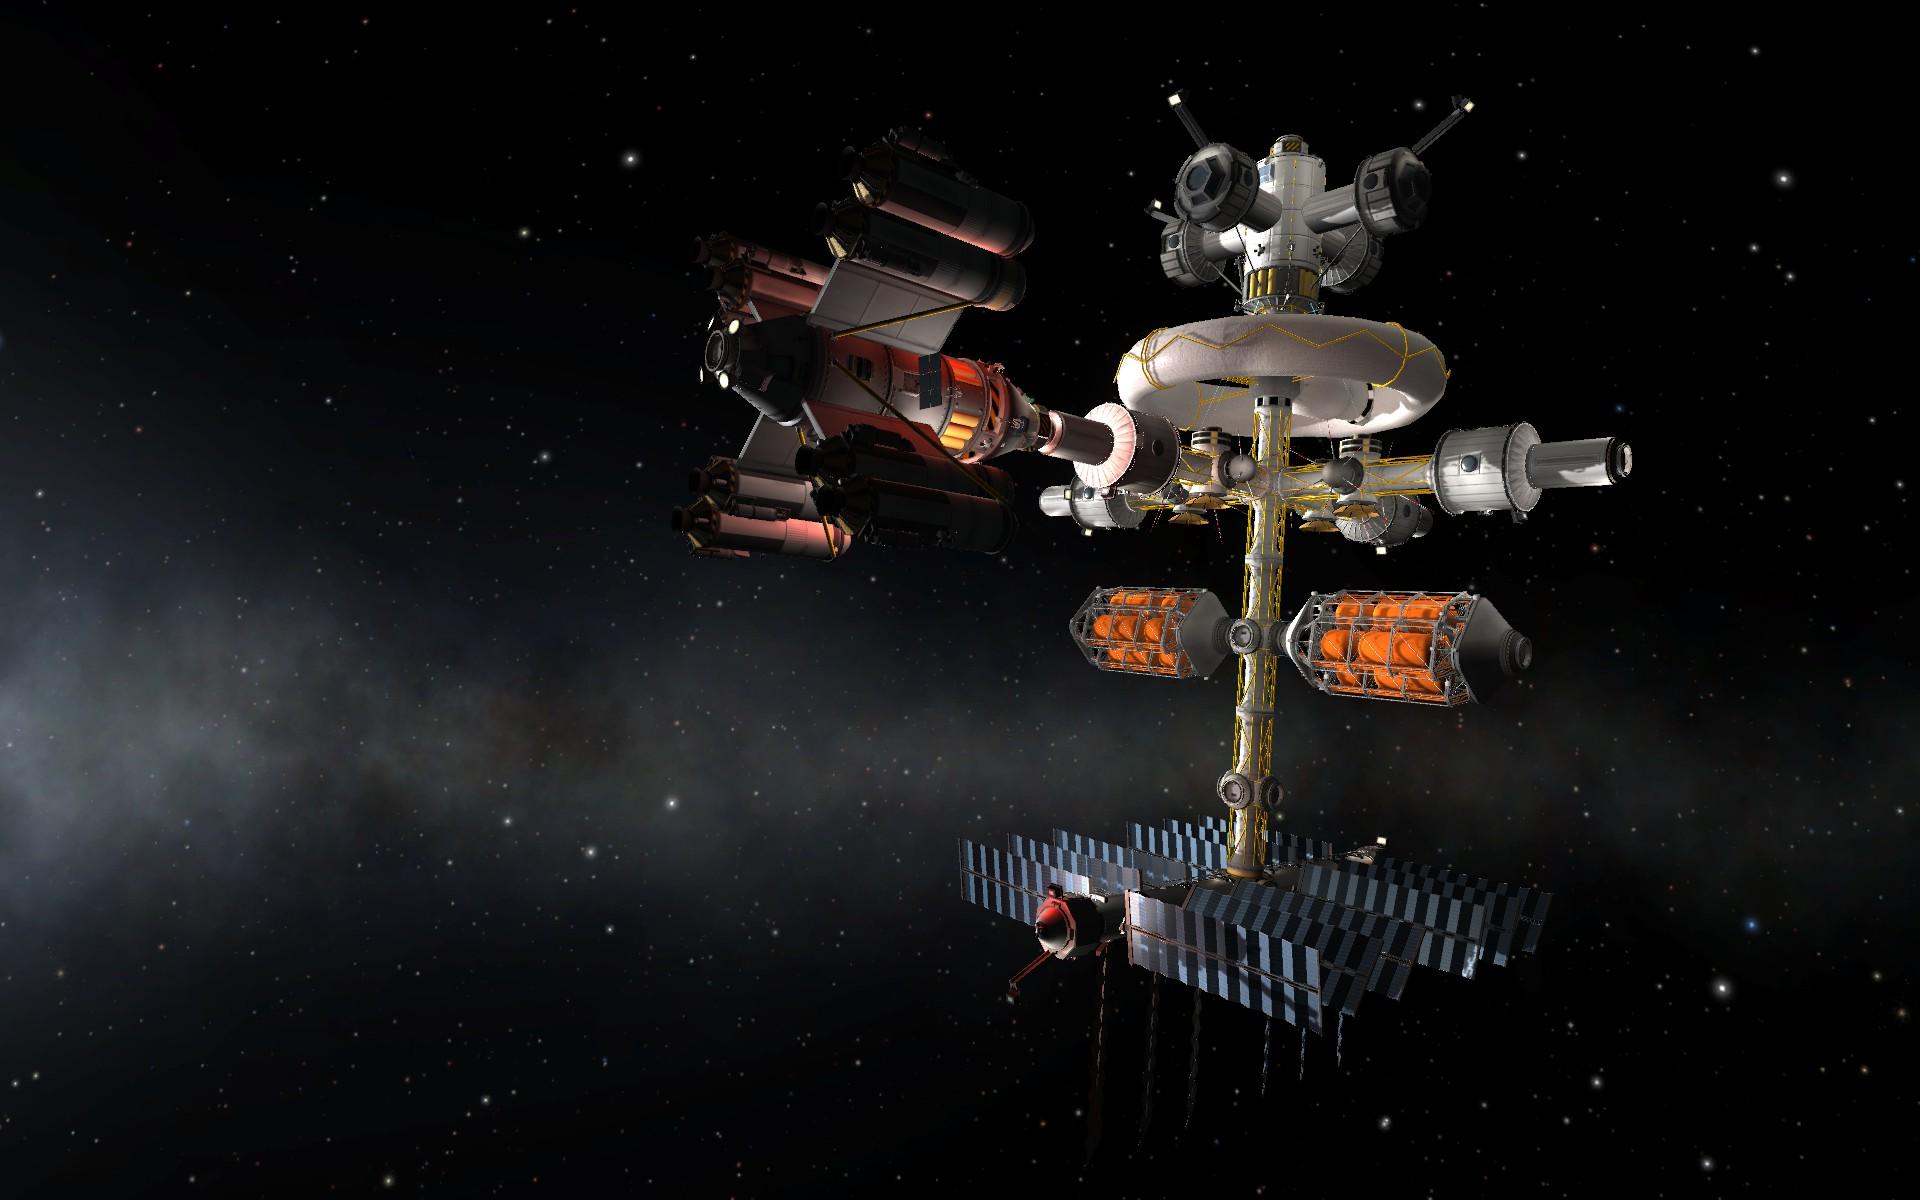 Kerbal Space Program Space Station Wallpaper Satellite